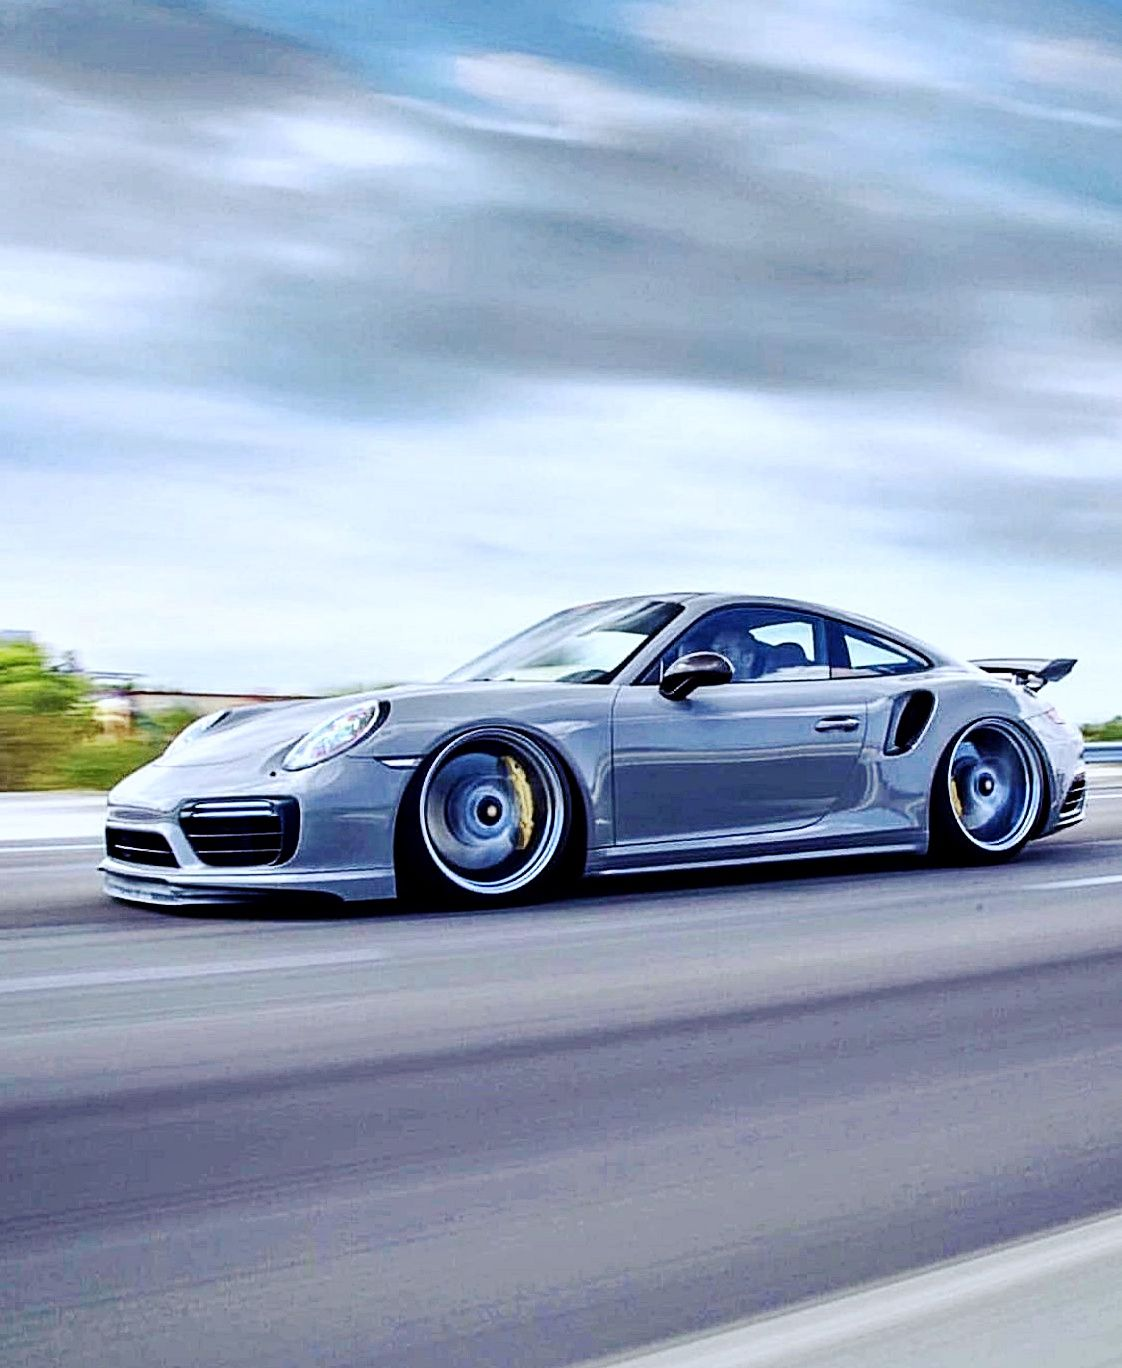 Best Cheap Foreign Cars Sports Cars Sports Cars Luxury Porsche Replica